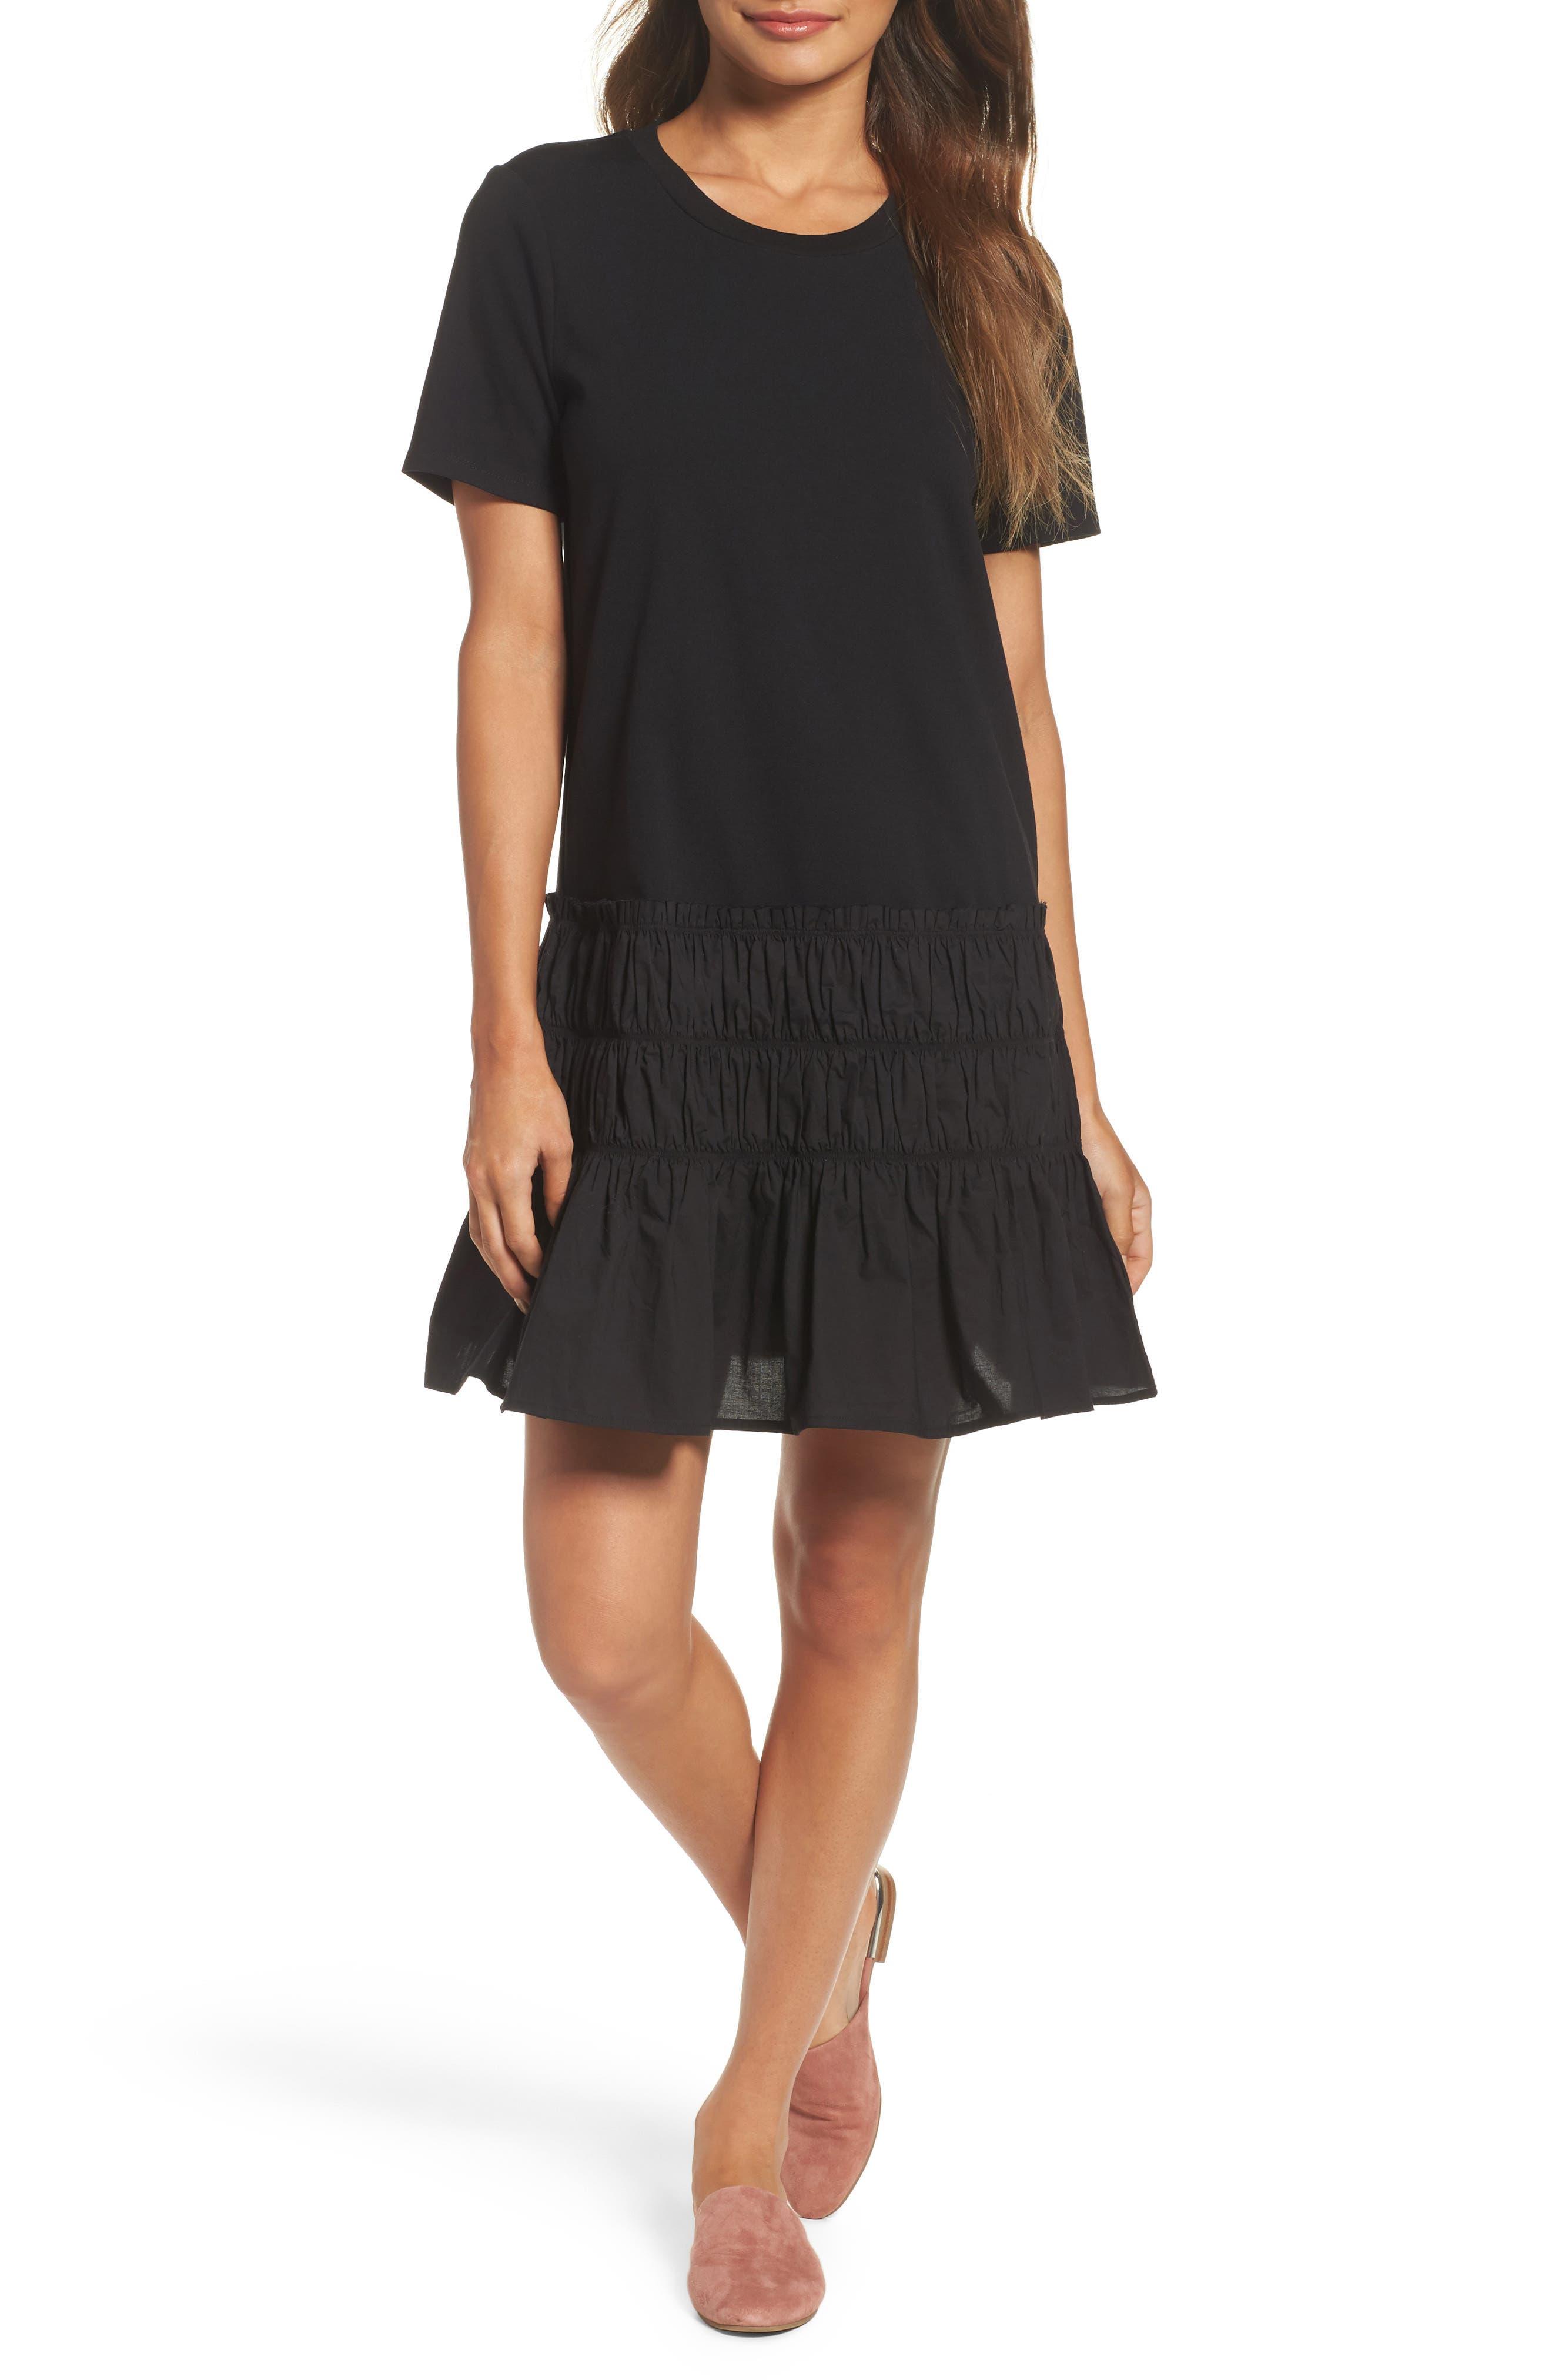 Main Image - Chelsea28 Smocked T-Shirt Dress